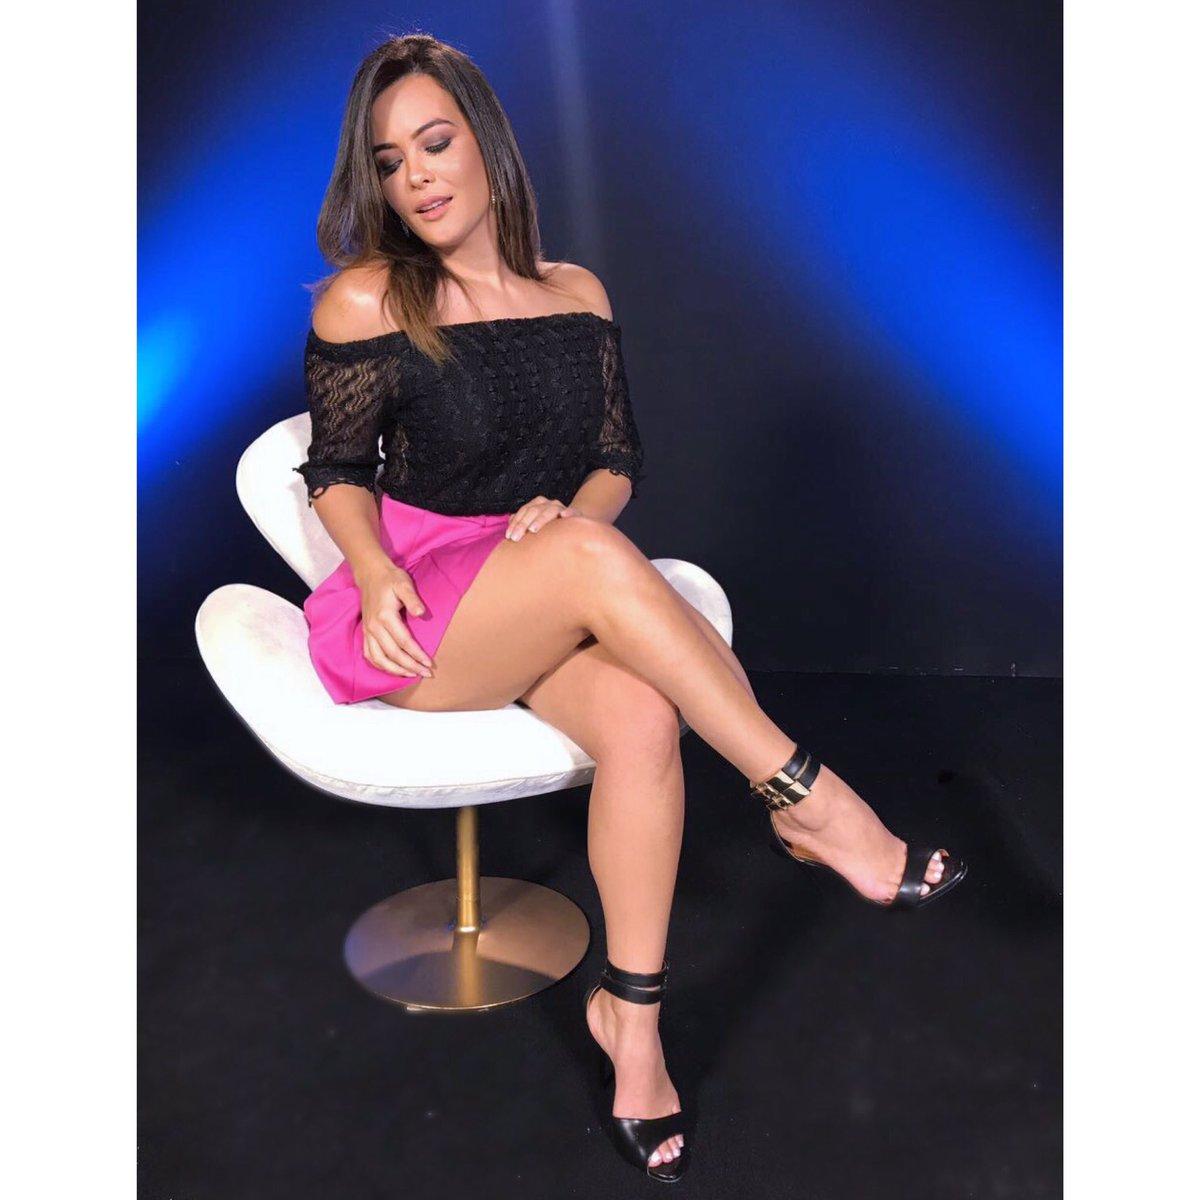 2019 Geisy Arruda nude (71 photos), Topless, Sideboobs, Feet, panties 2017